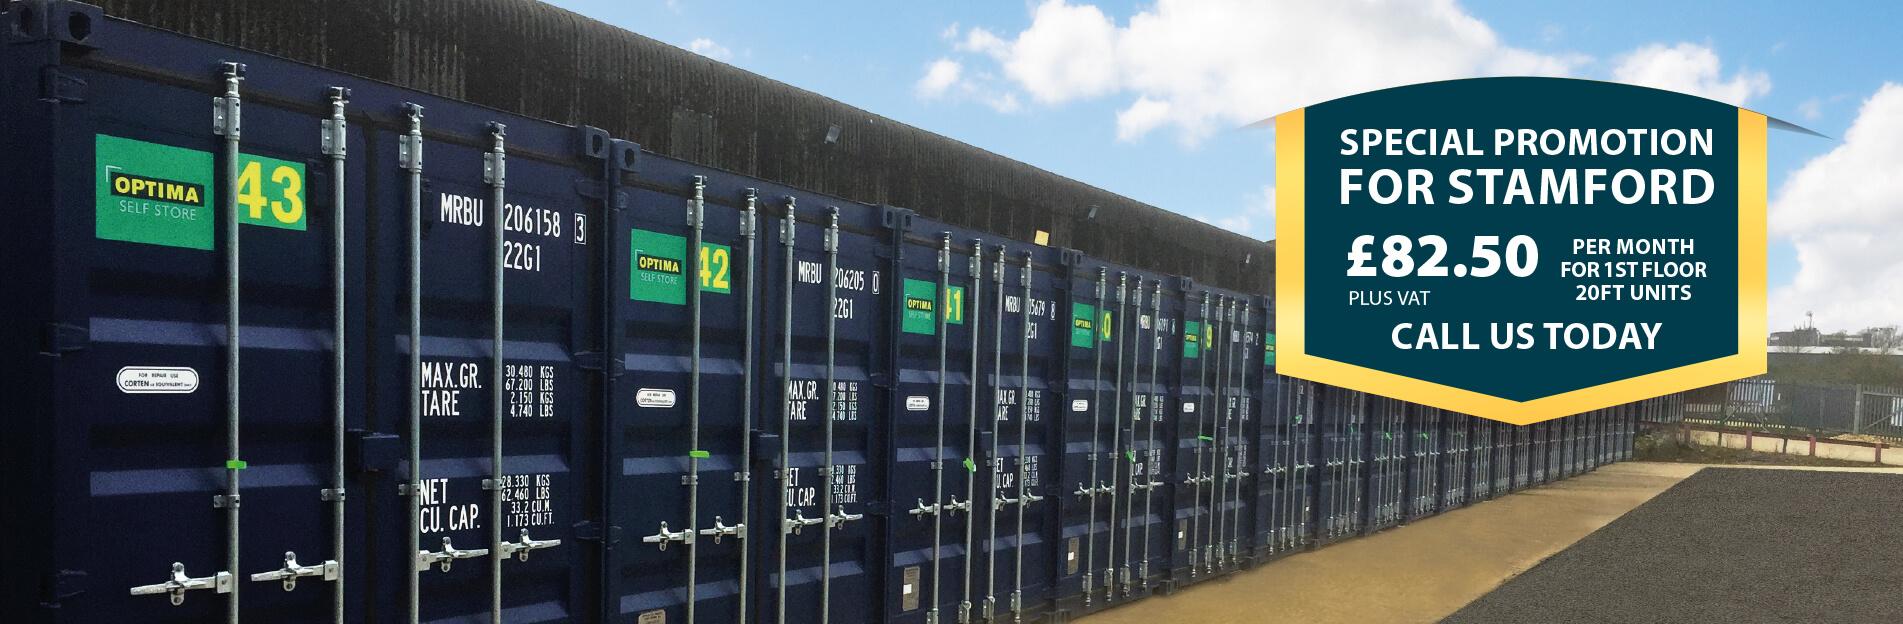 Stamford Self Storage